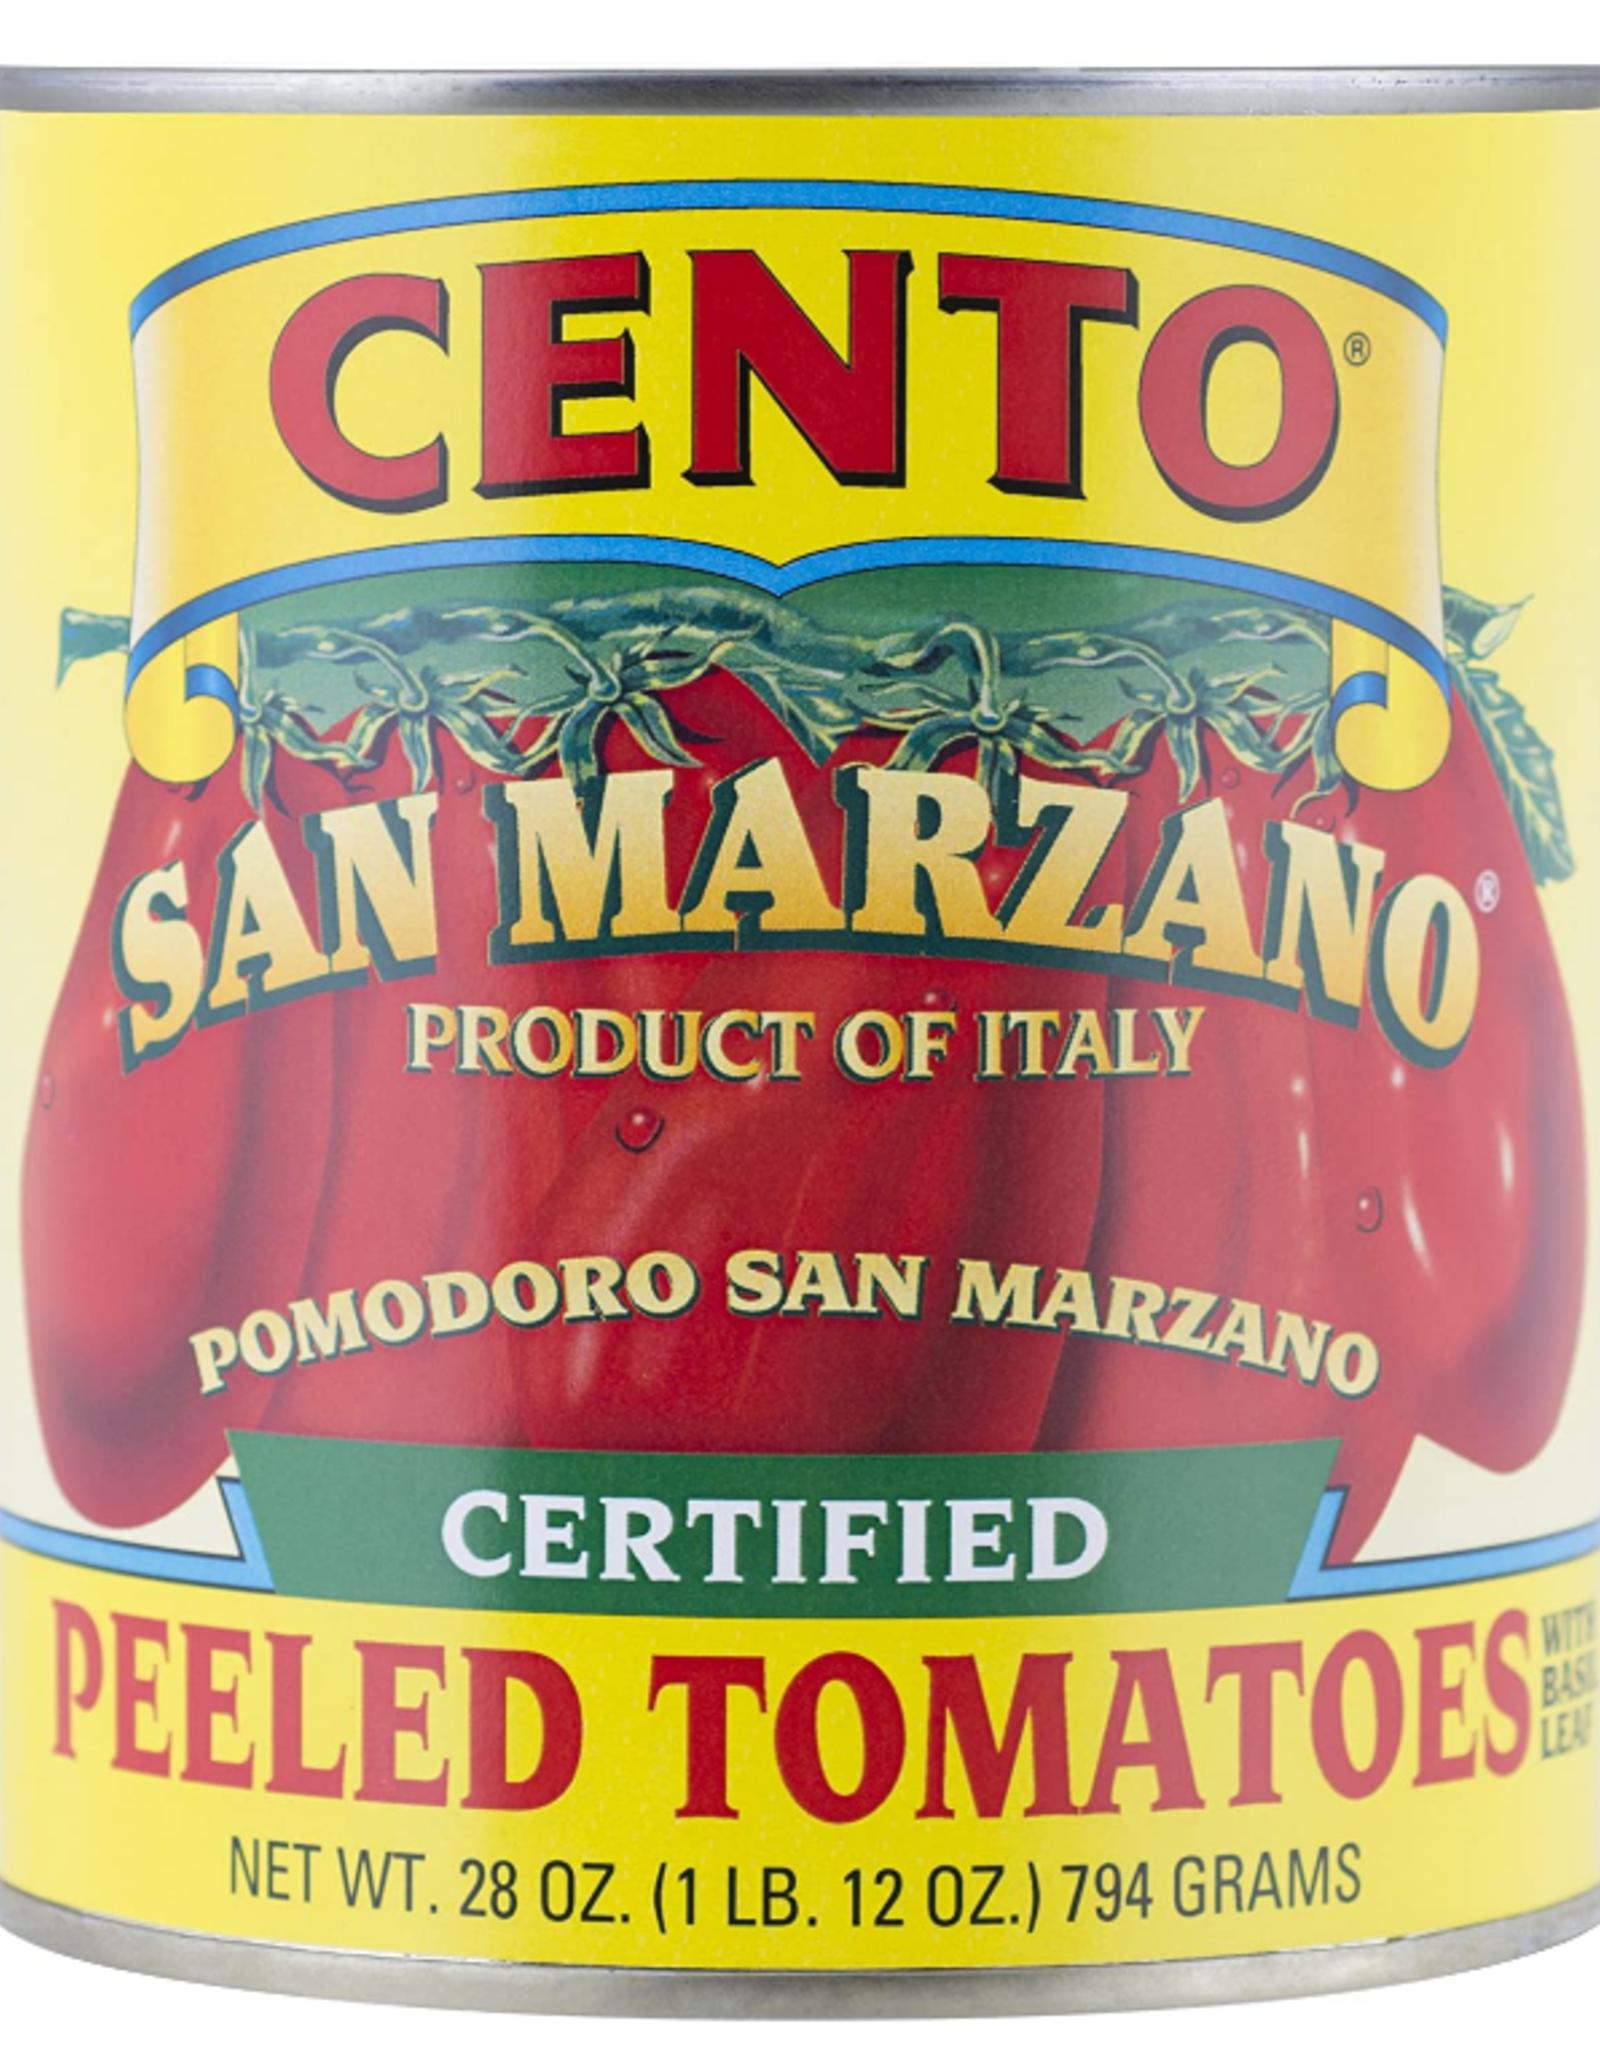 UNFI Cento San Marzano Peeled Tomatoes